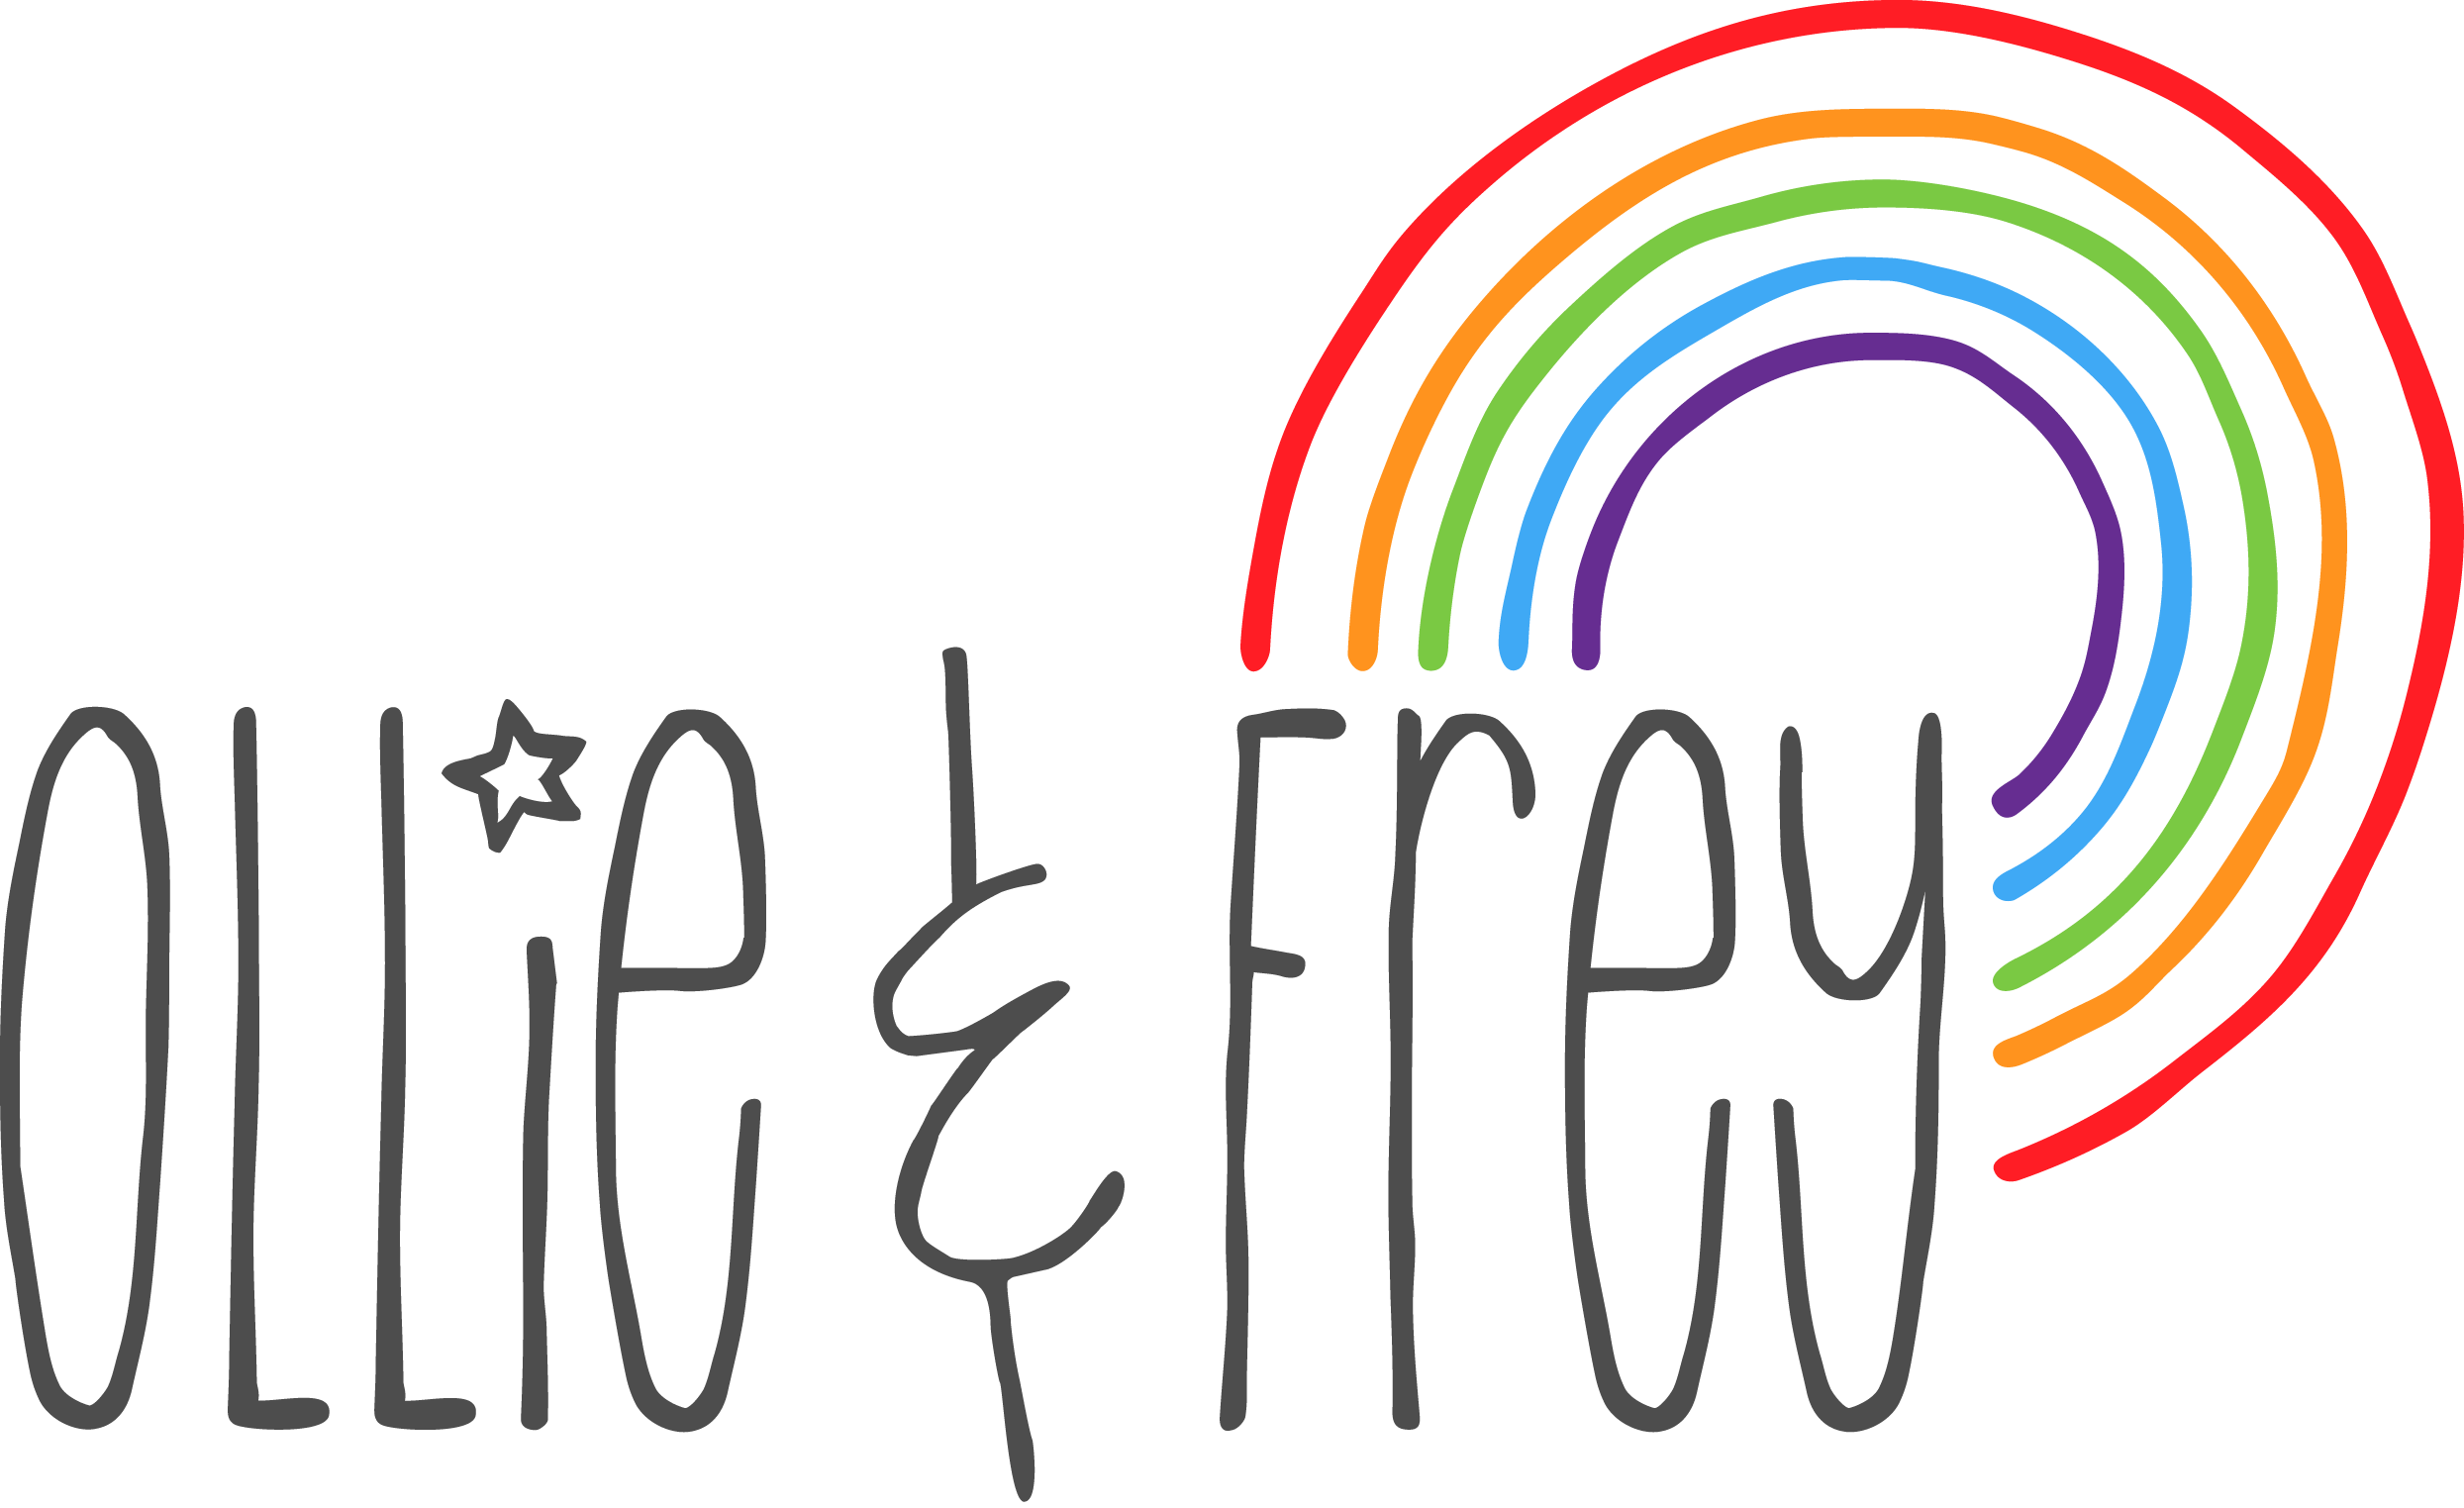 Ollie&Frey